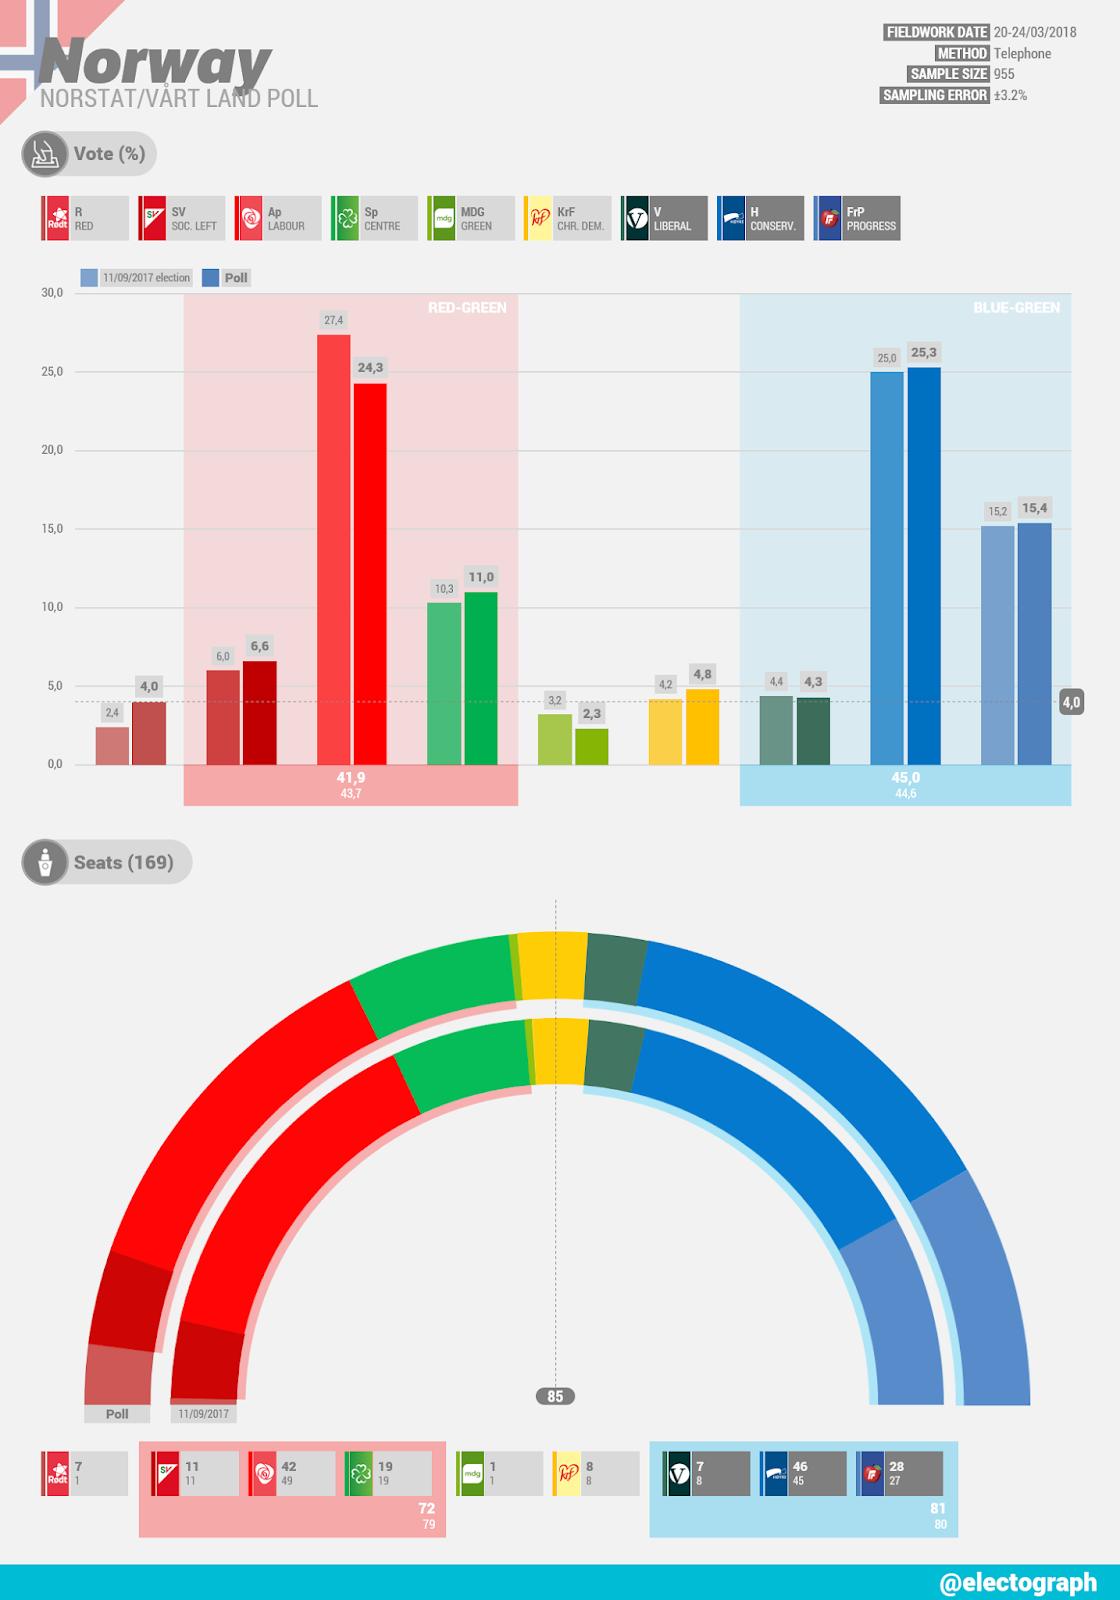 NORWAY Norstat poll chart for Vårt Land, March 2018